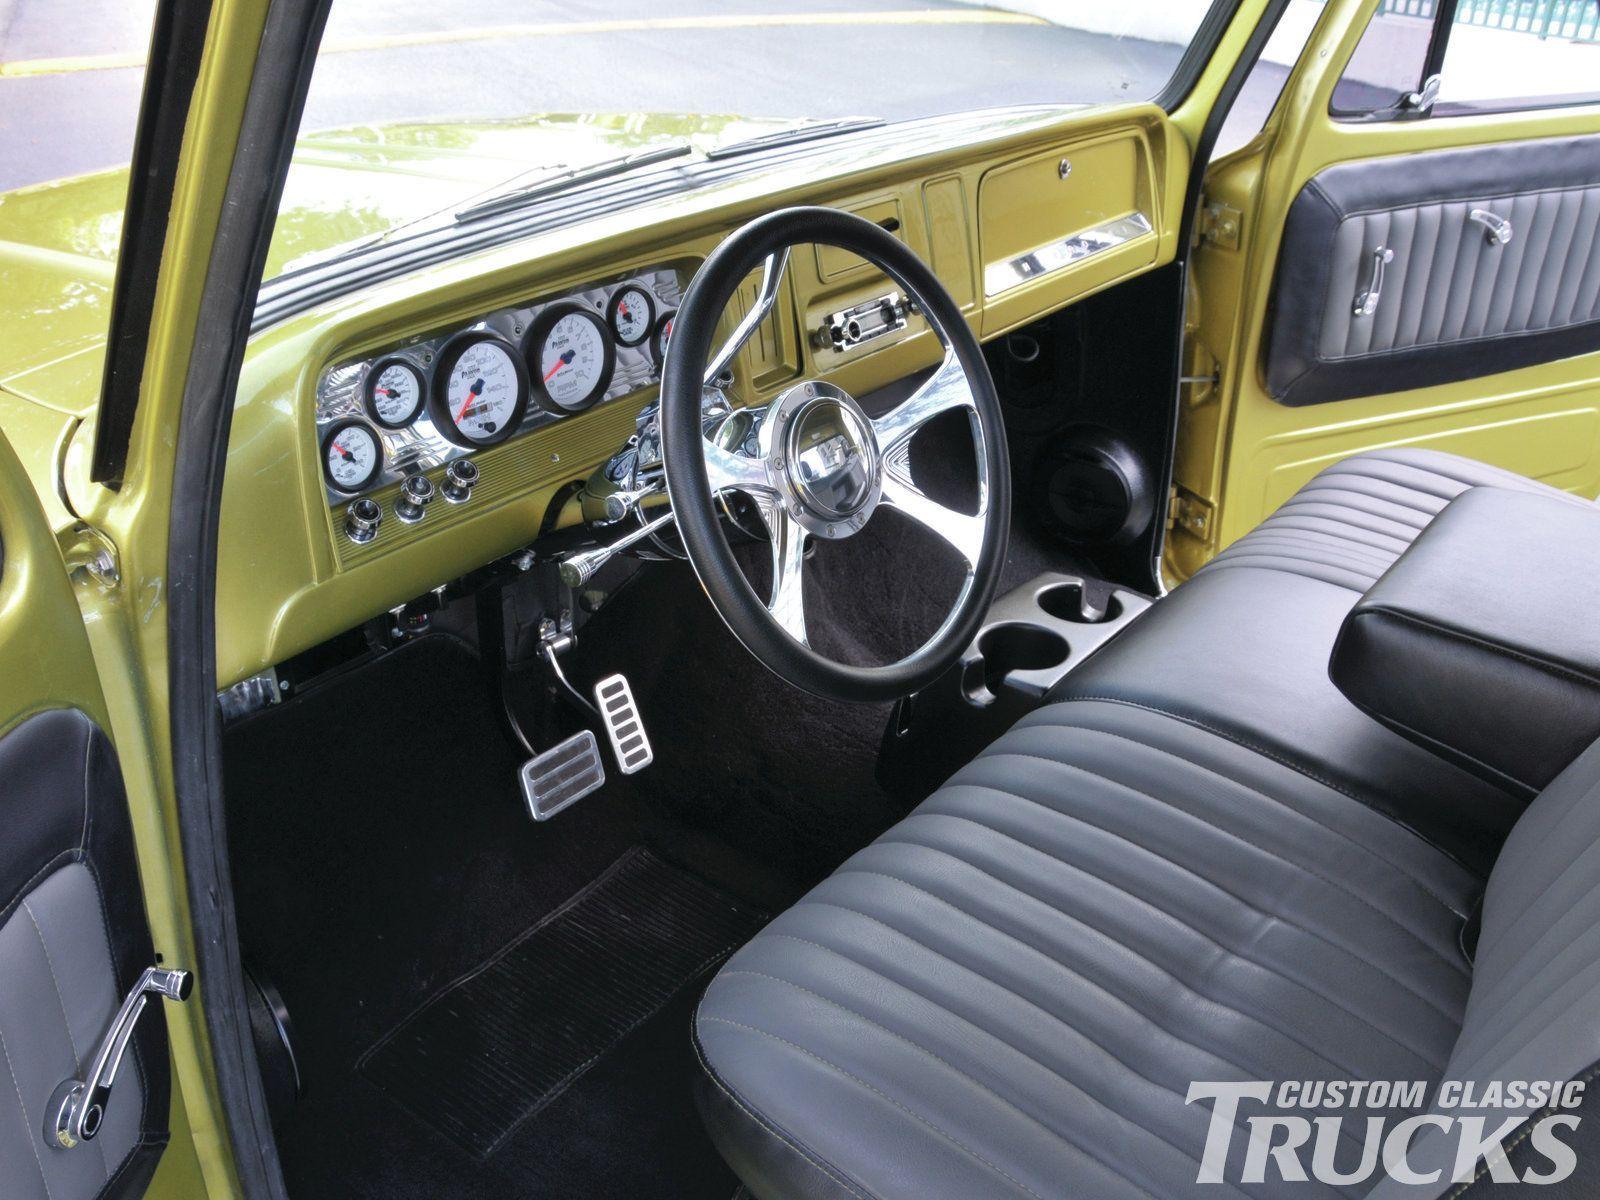 1977 C10 Chevrolet Truck 1966 Interior Circuit Board S10 Pickup Blazer S15 Jimmy Dash Cluster